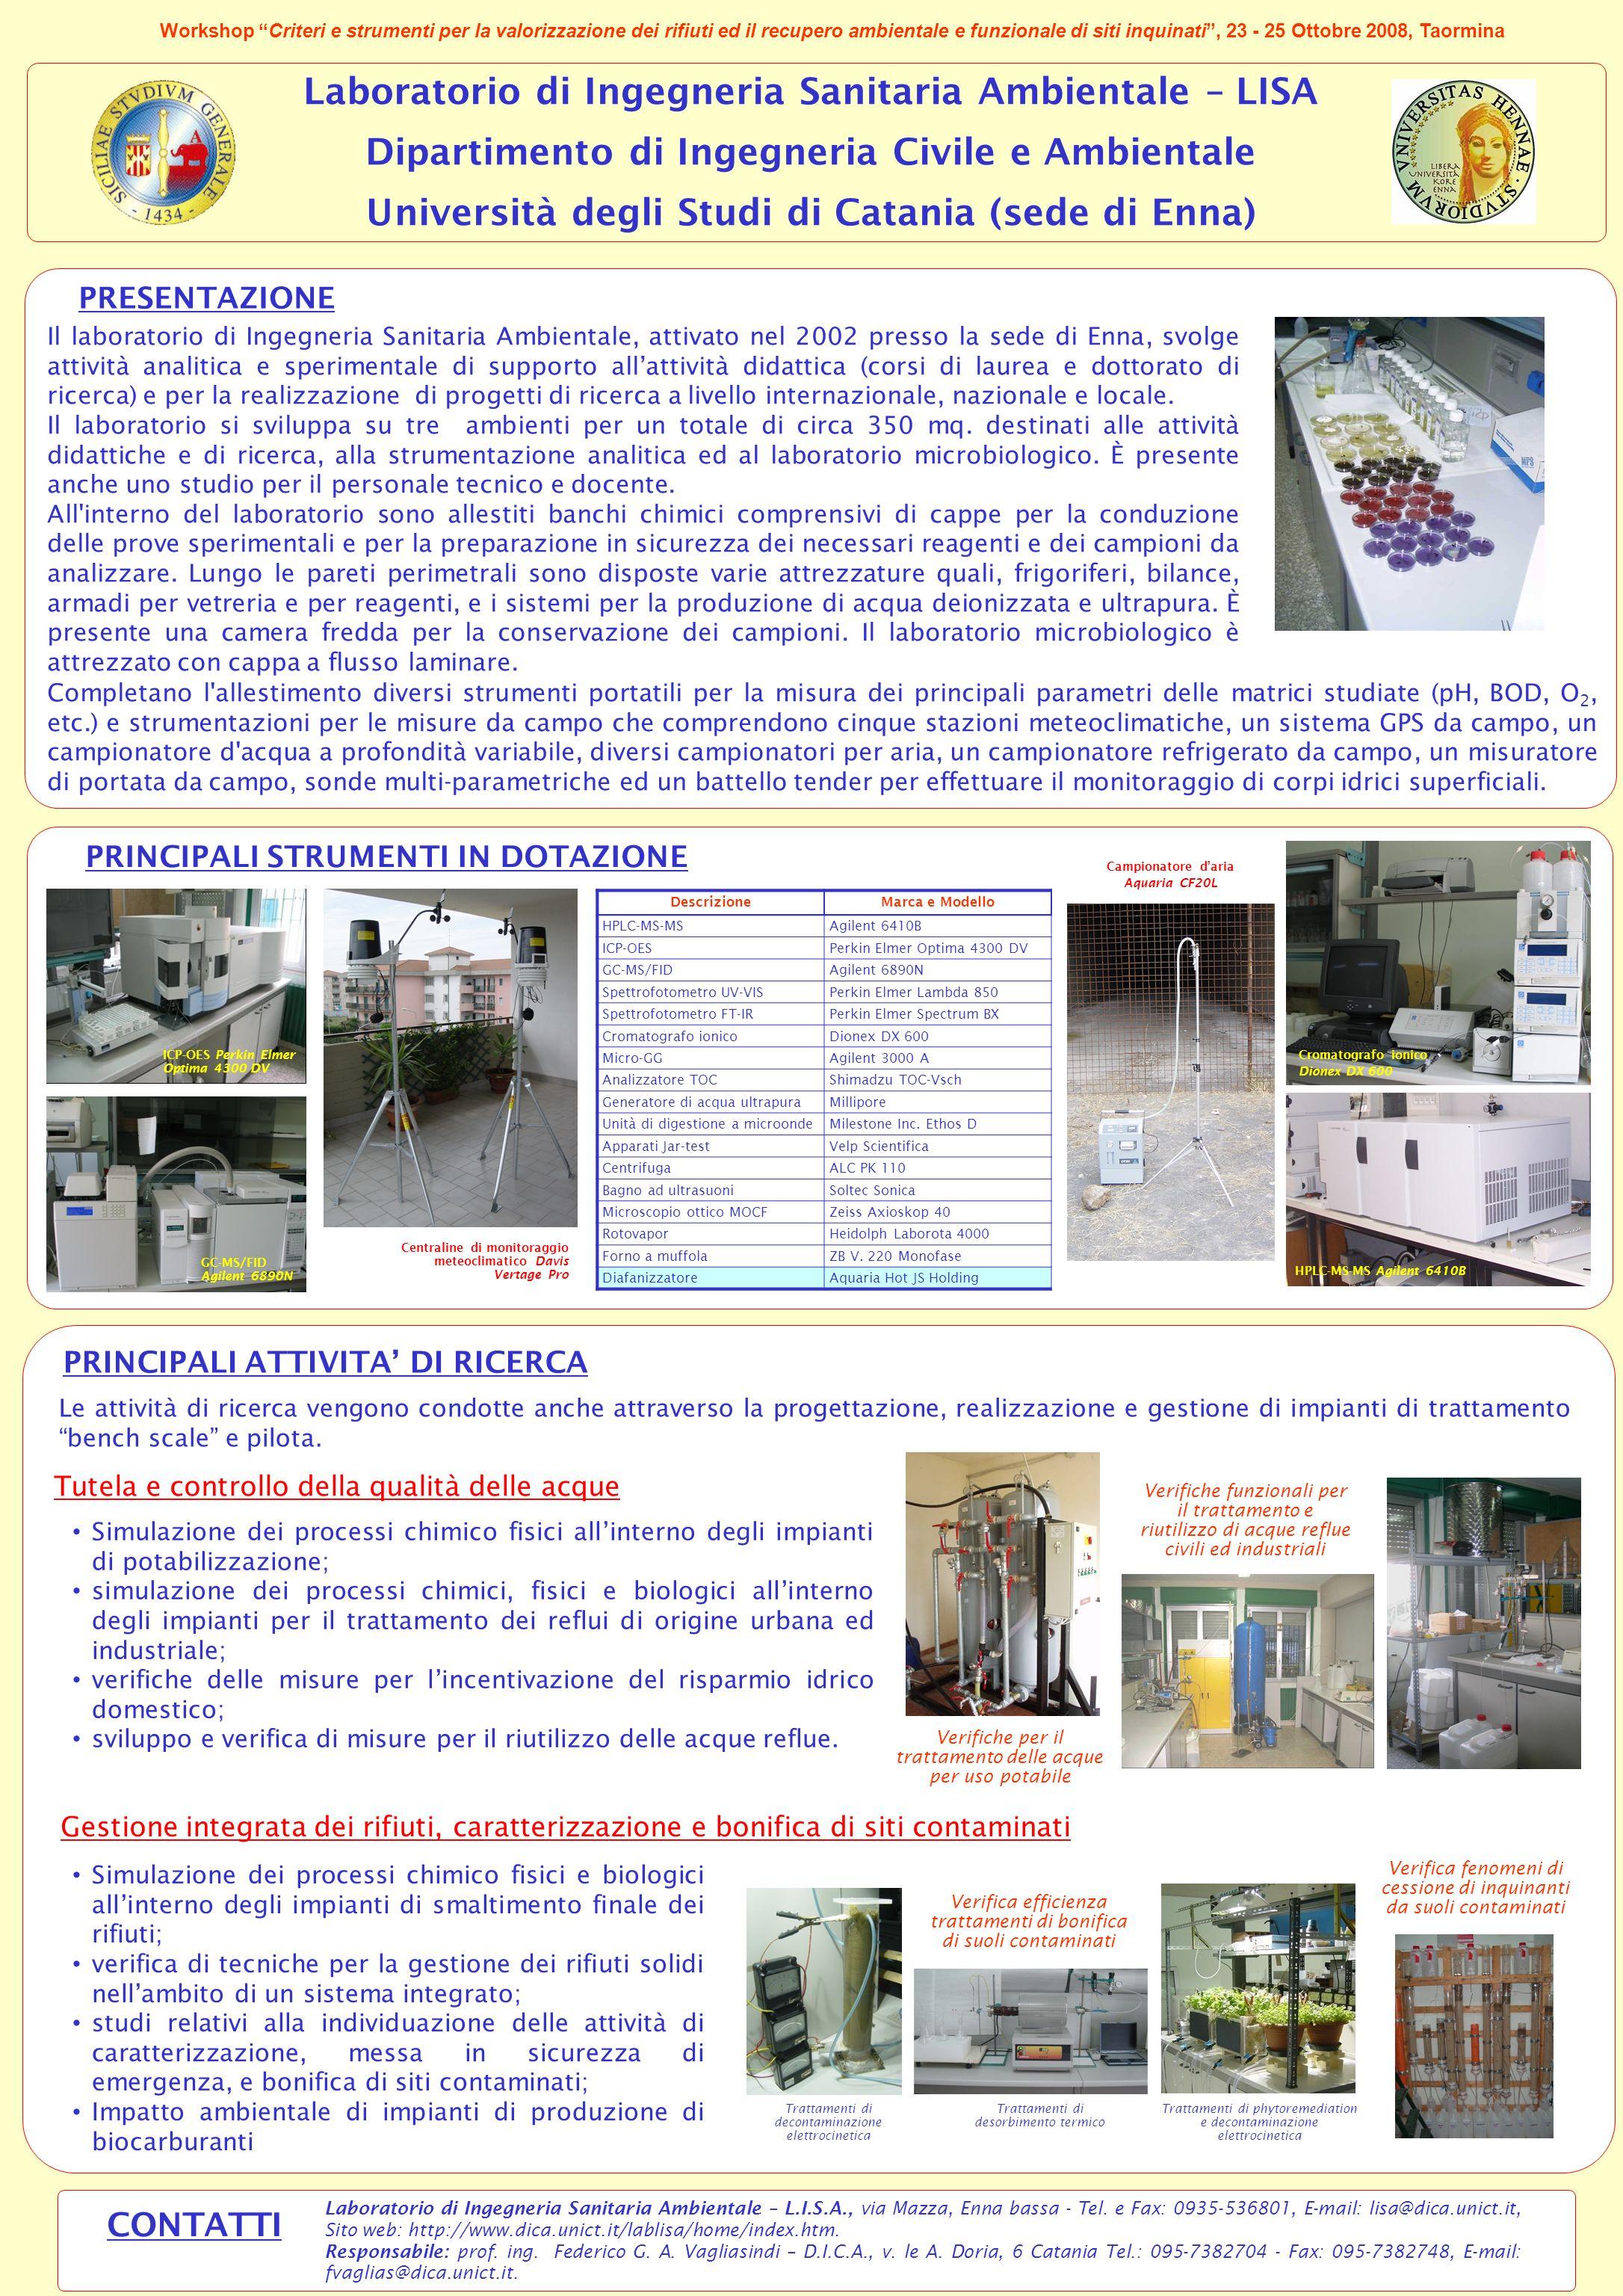 Laboratorio di Ingegneria Sanitaria Ambientale – LISA